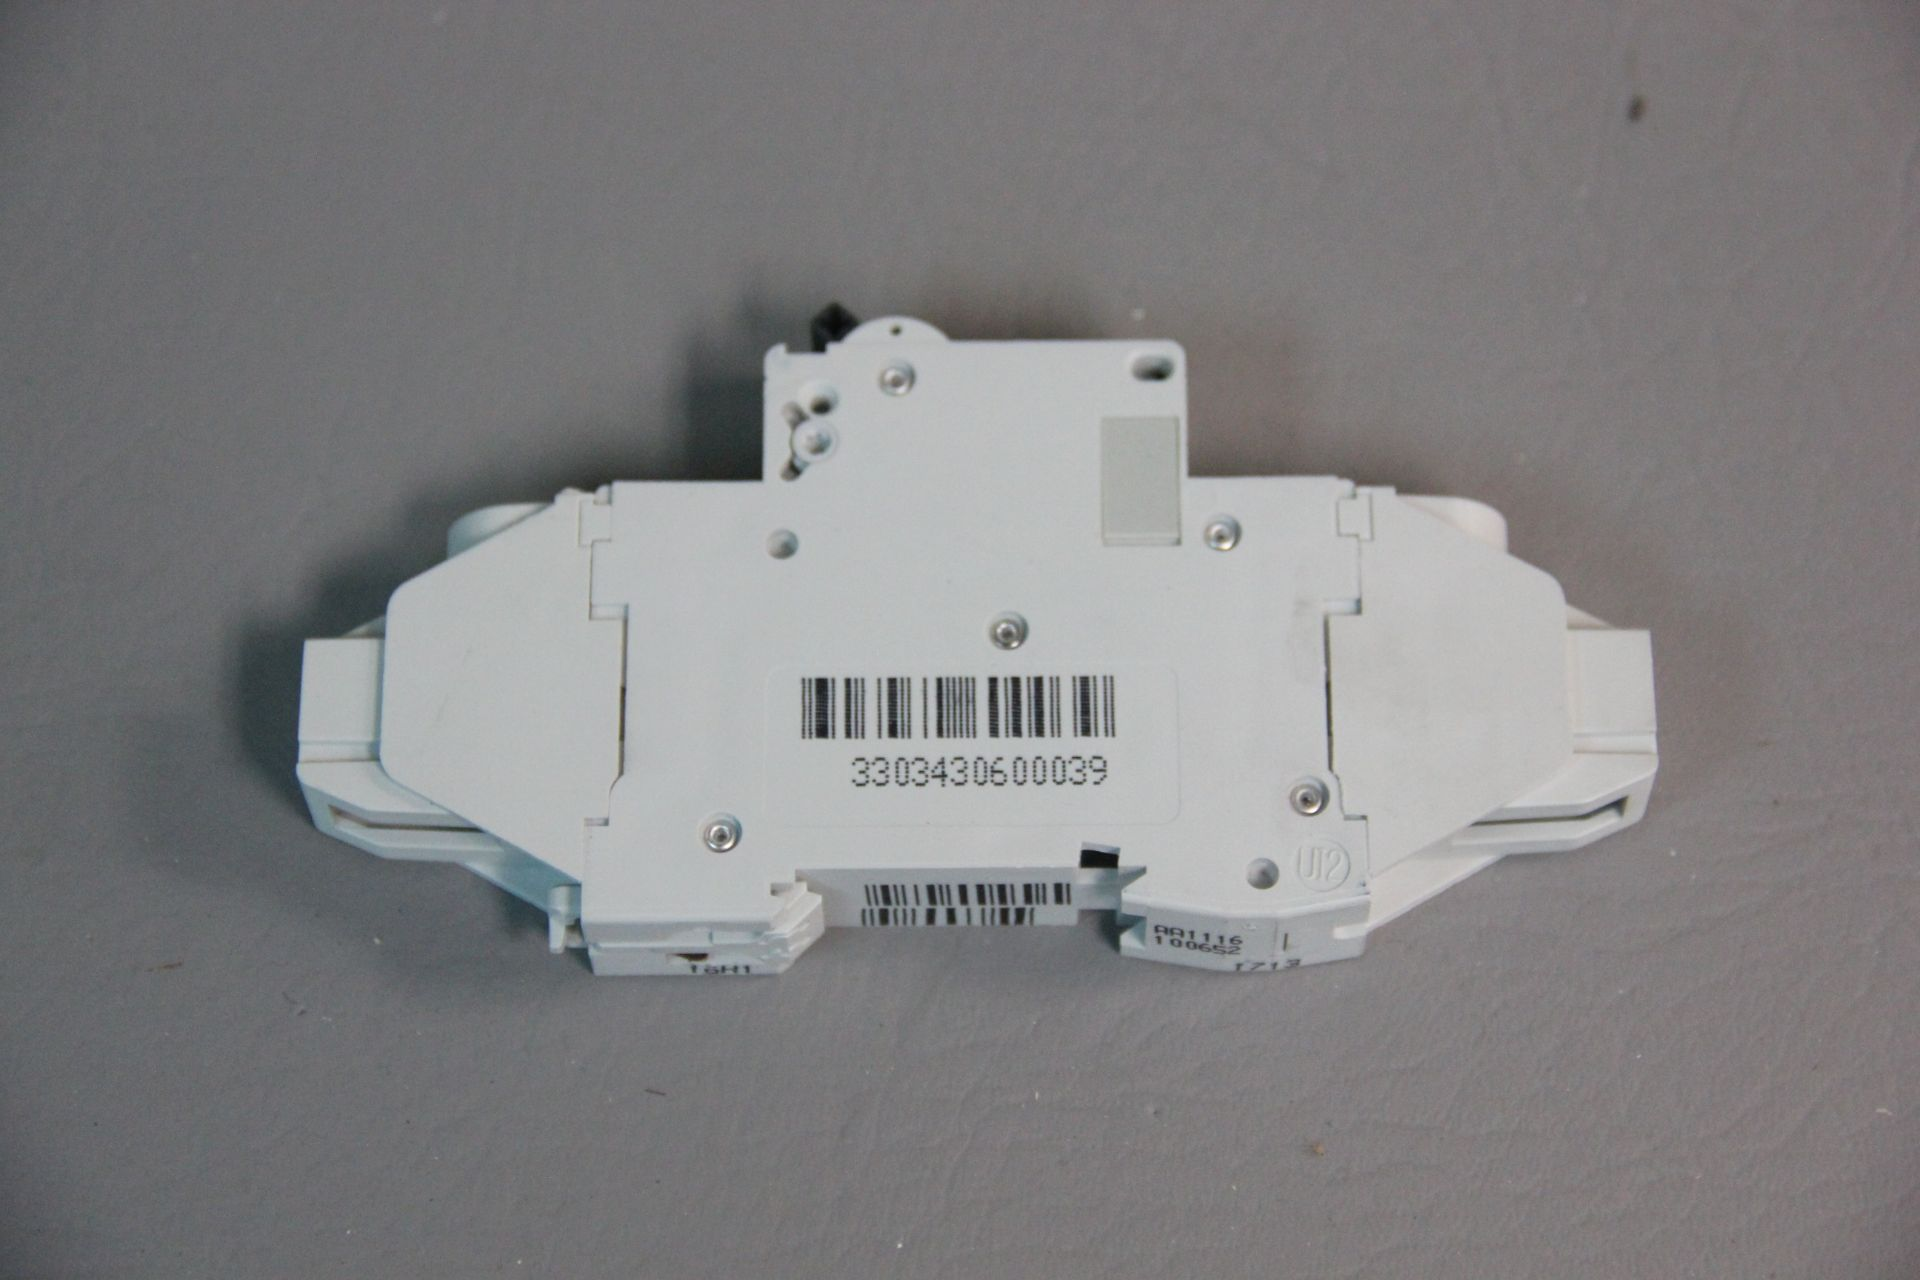 NEW SCHNEIDER MULTI 9 CIRCUIT BREAKER - Image 2 of 4